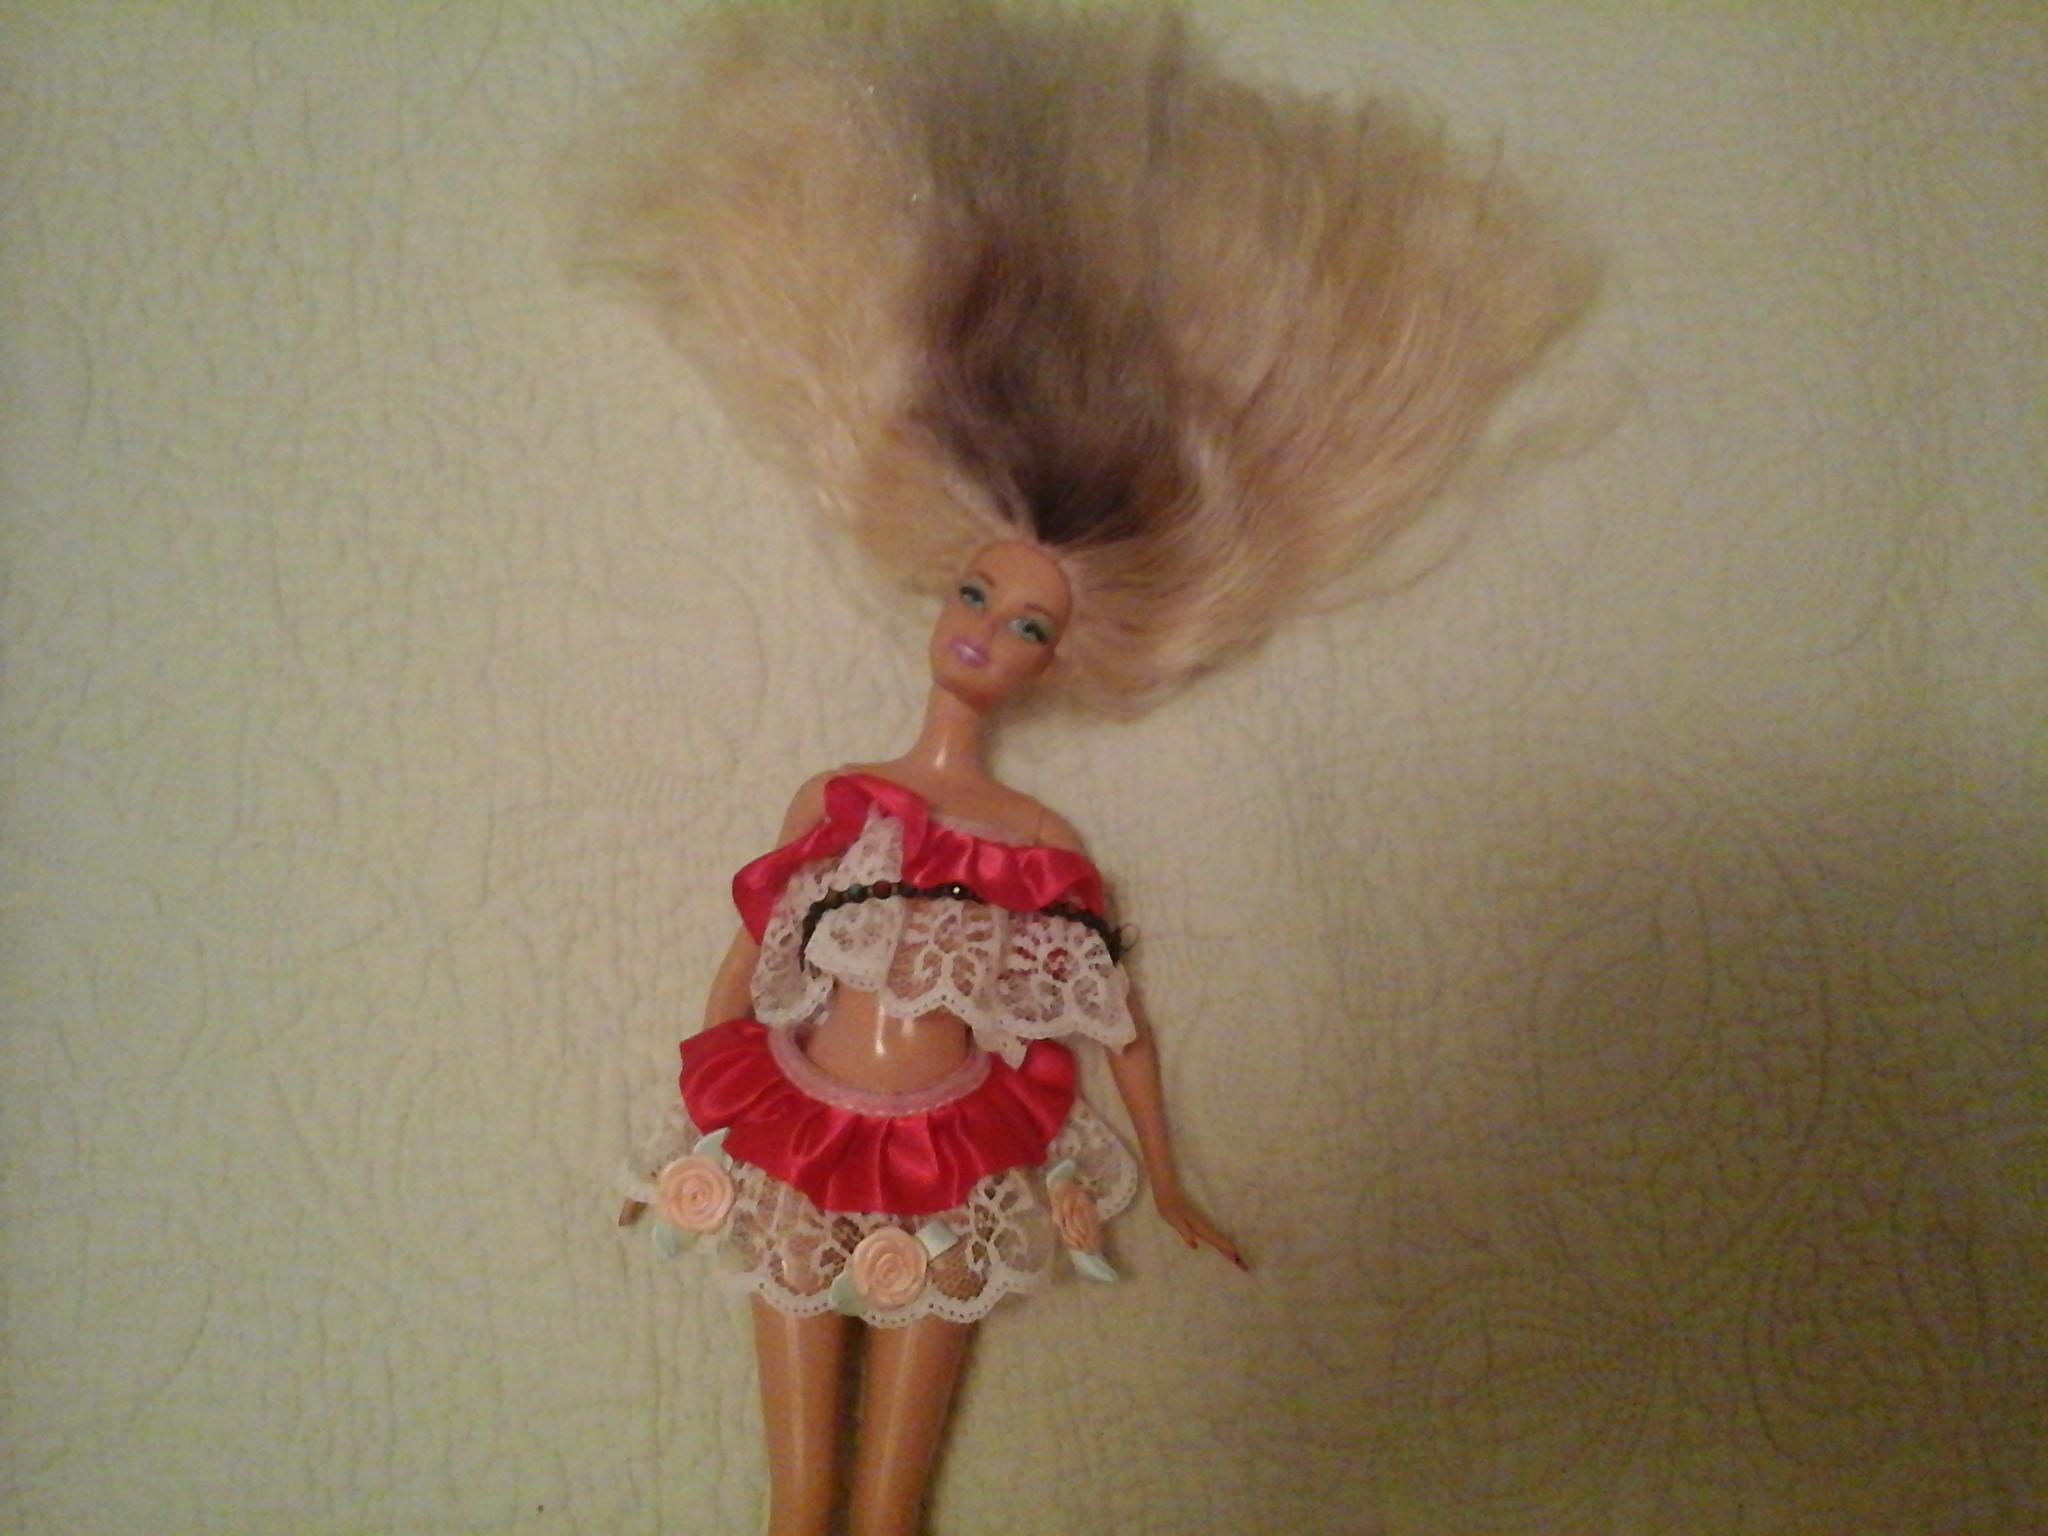 Barbie Photo - Magazine cover